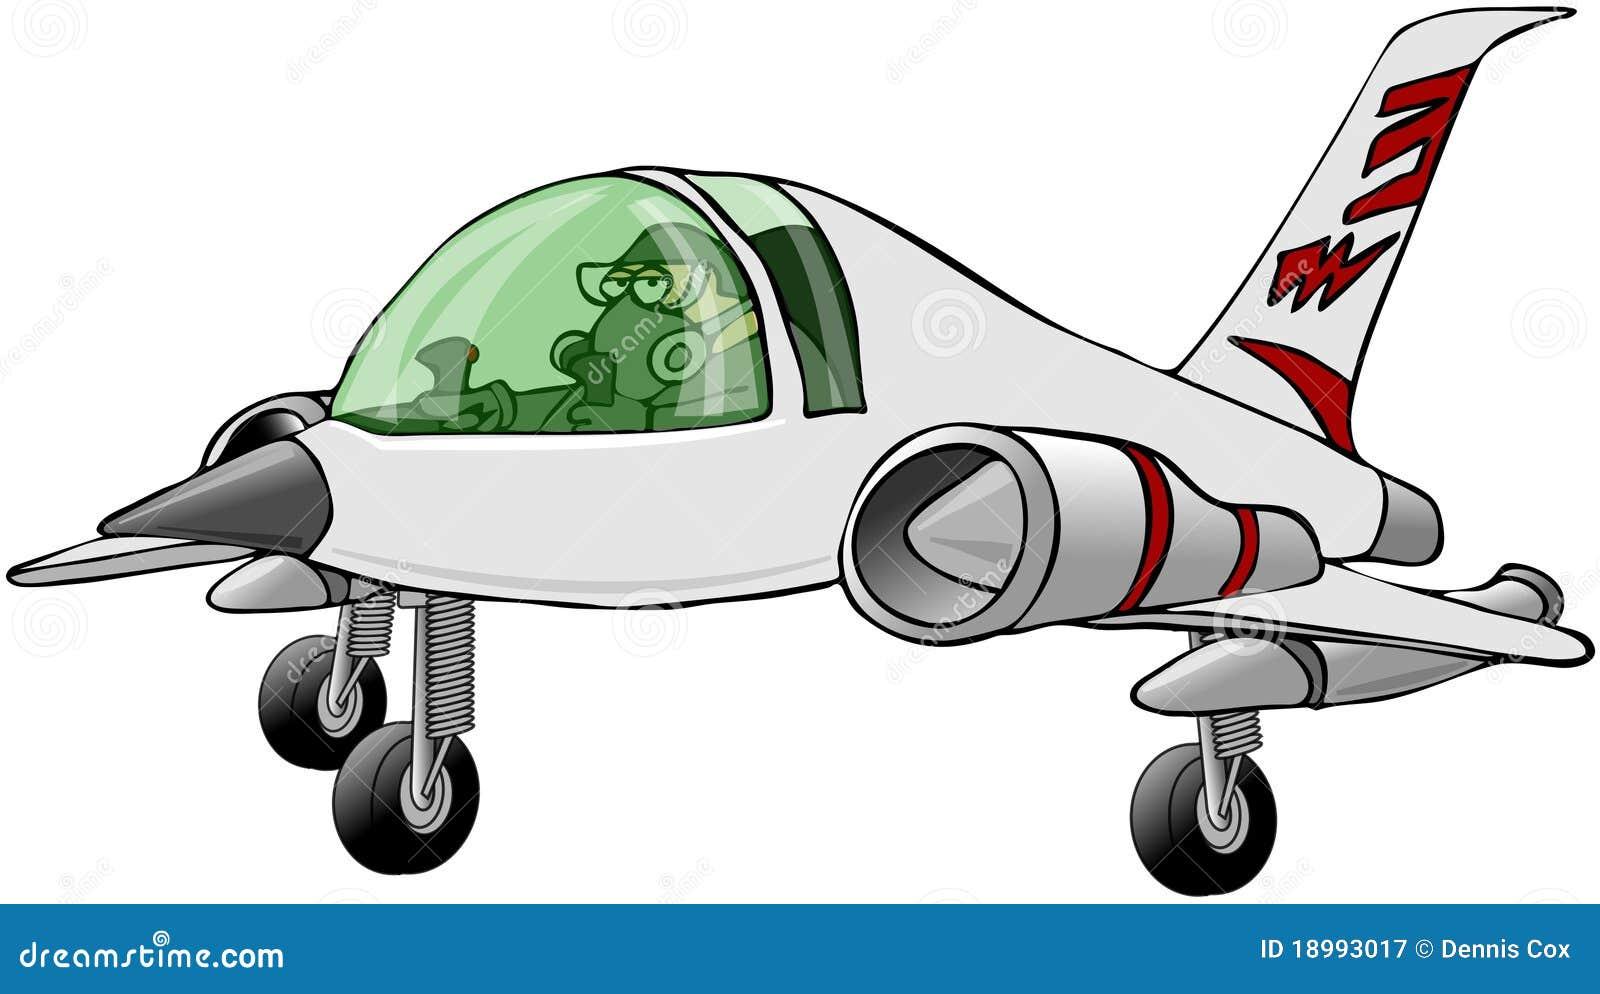 Pilote volar un jet